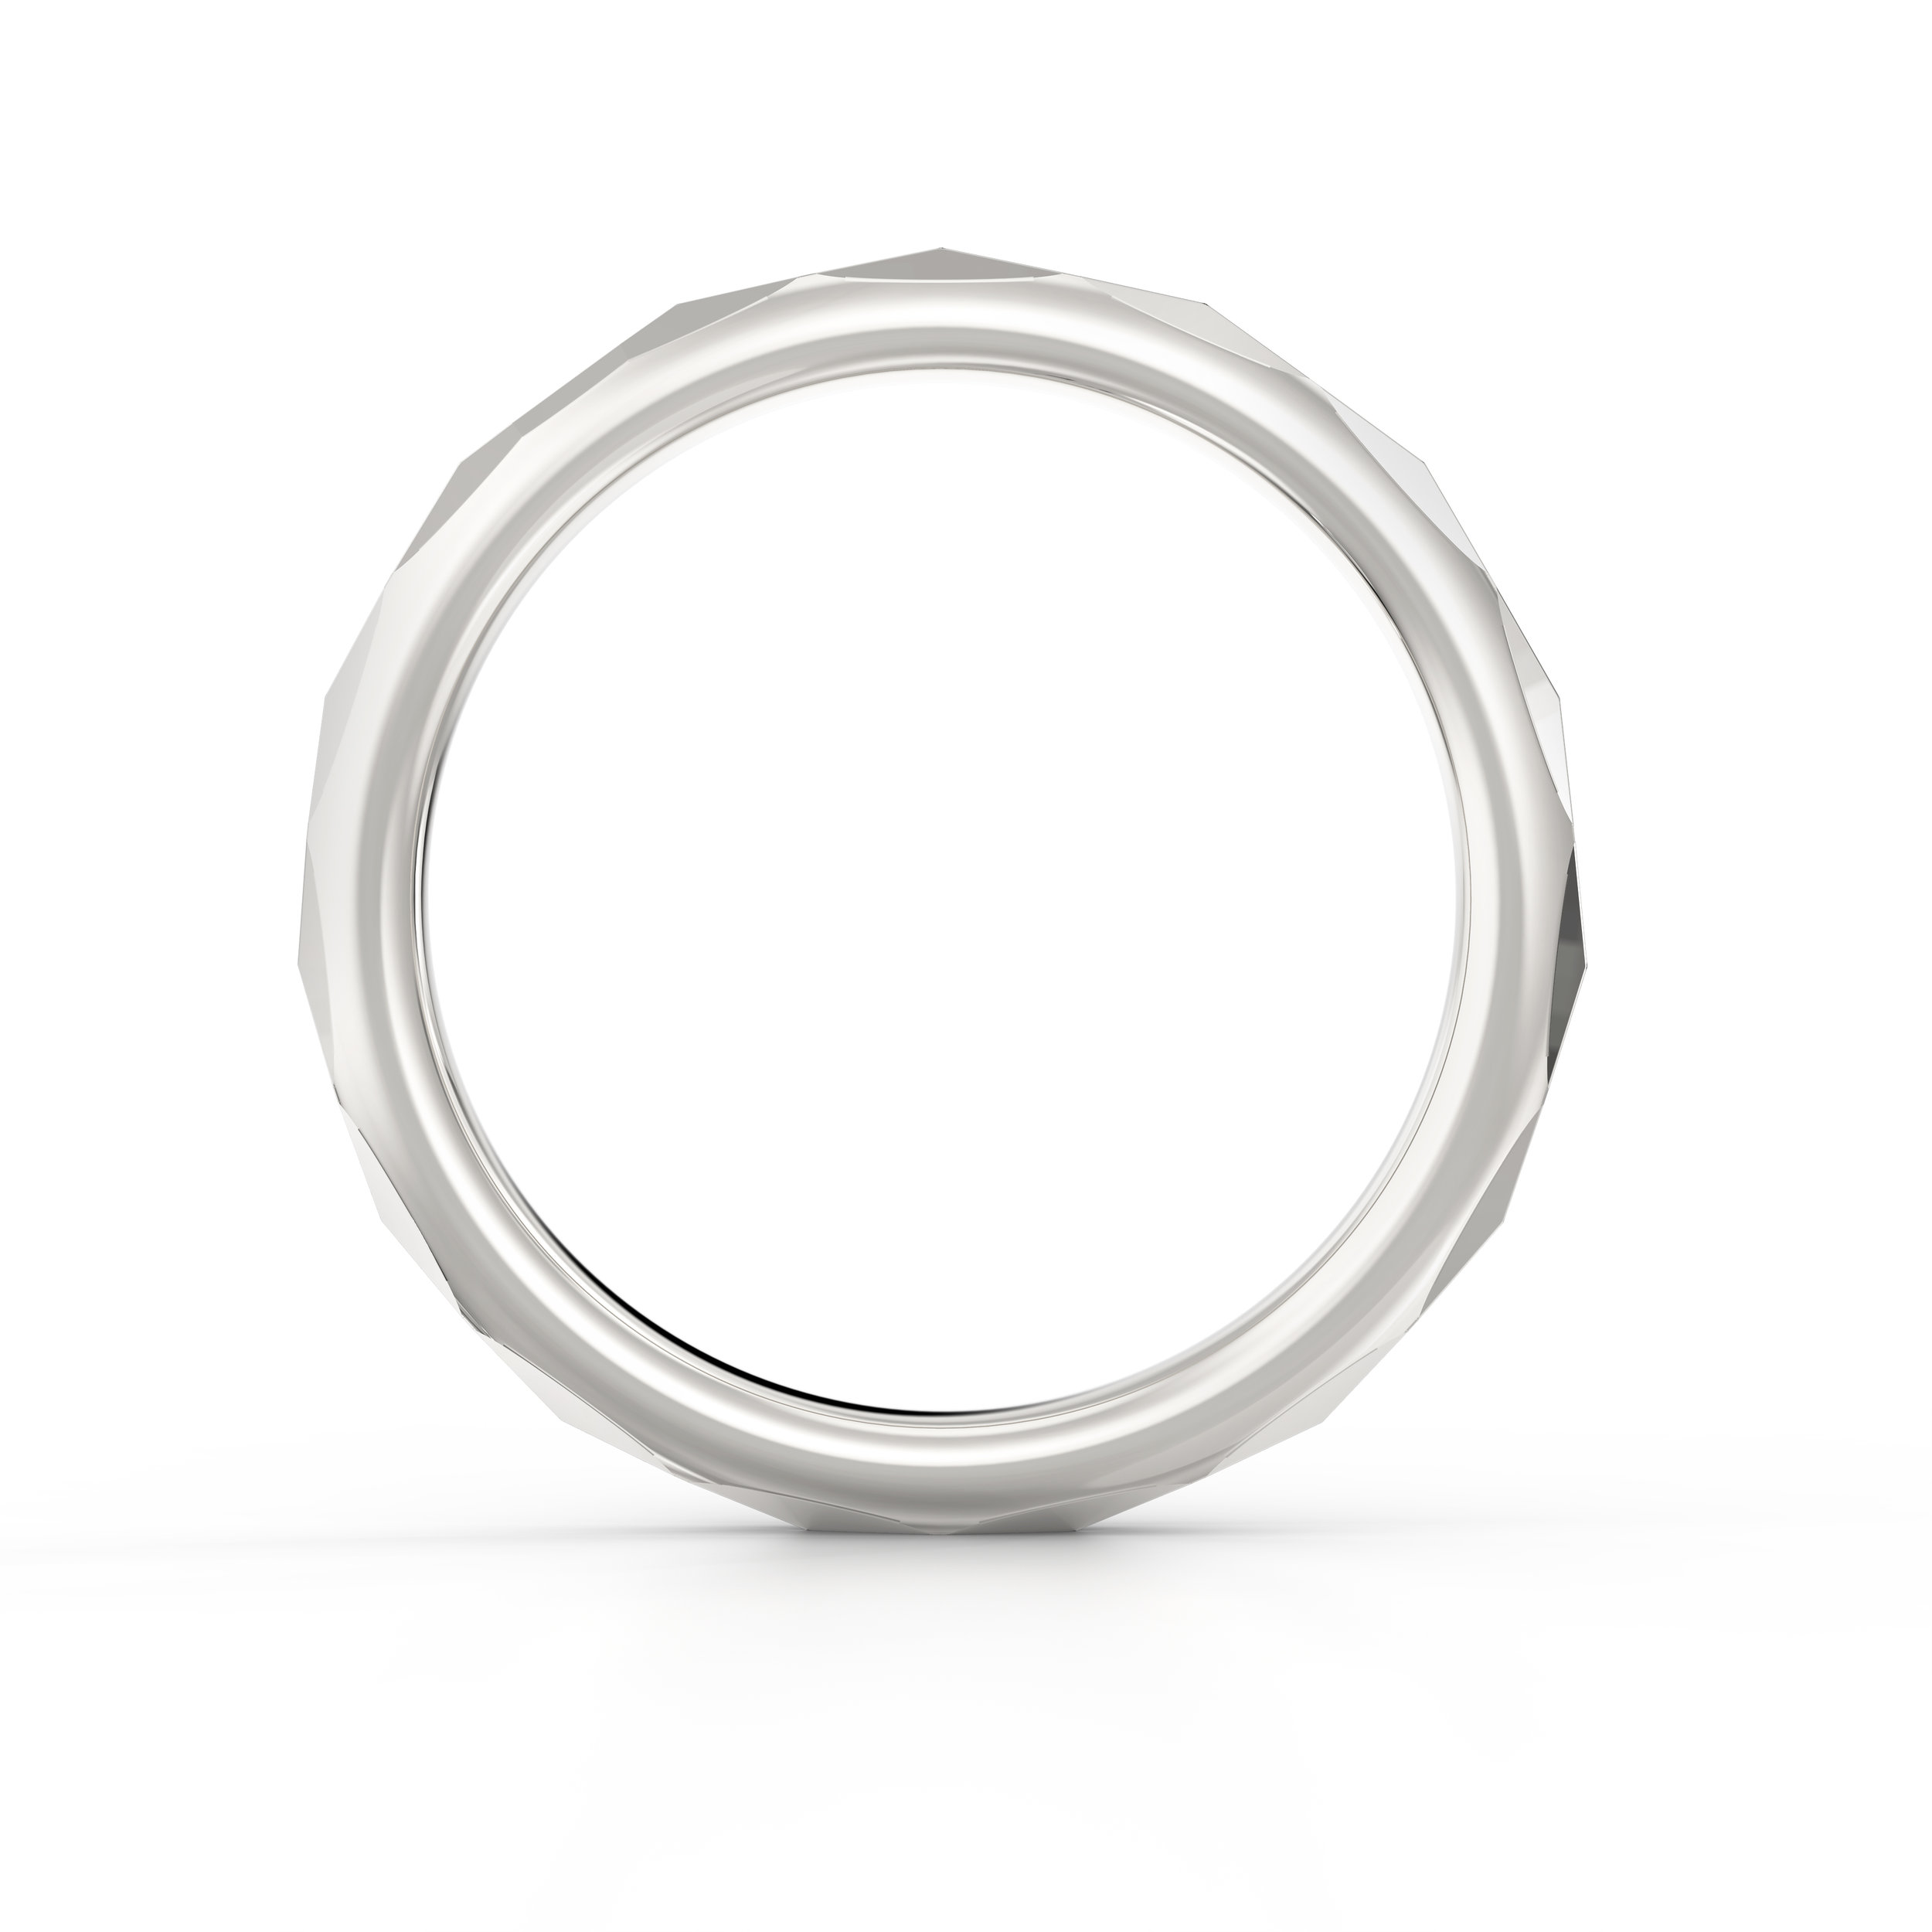 Ring_051_1.jpg